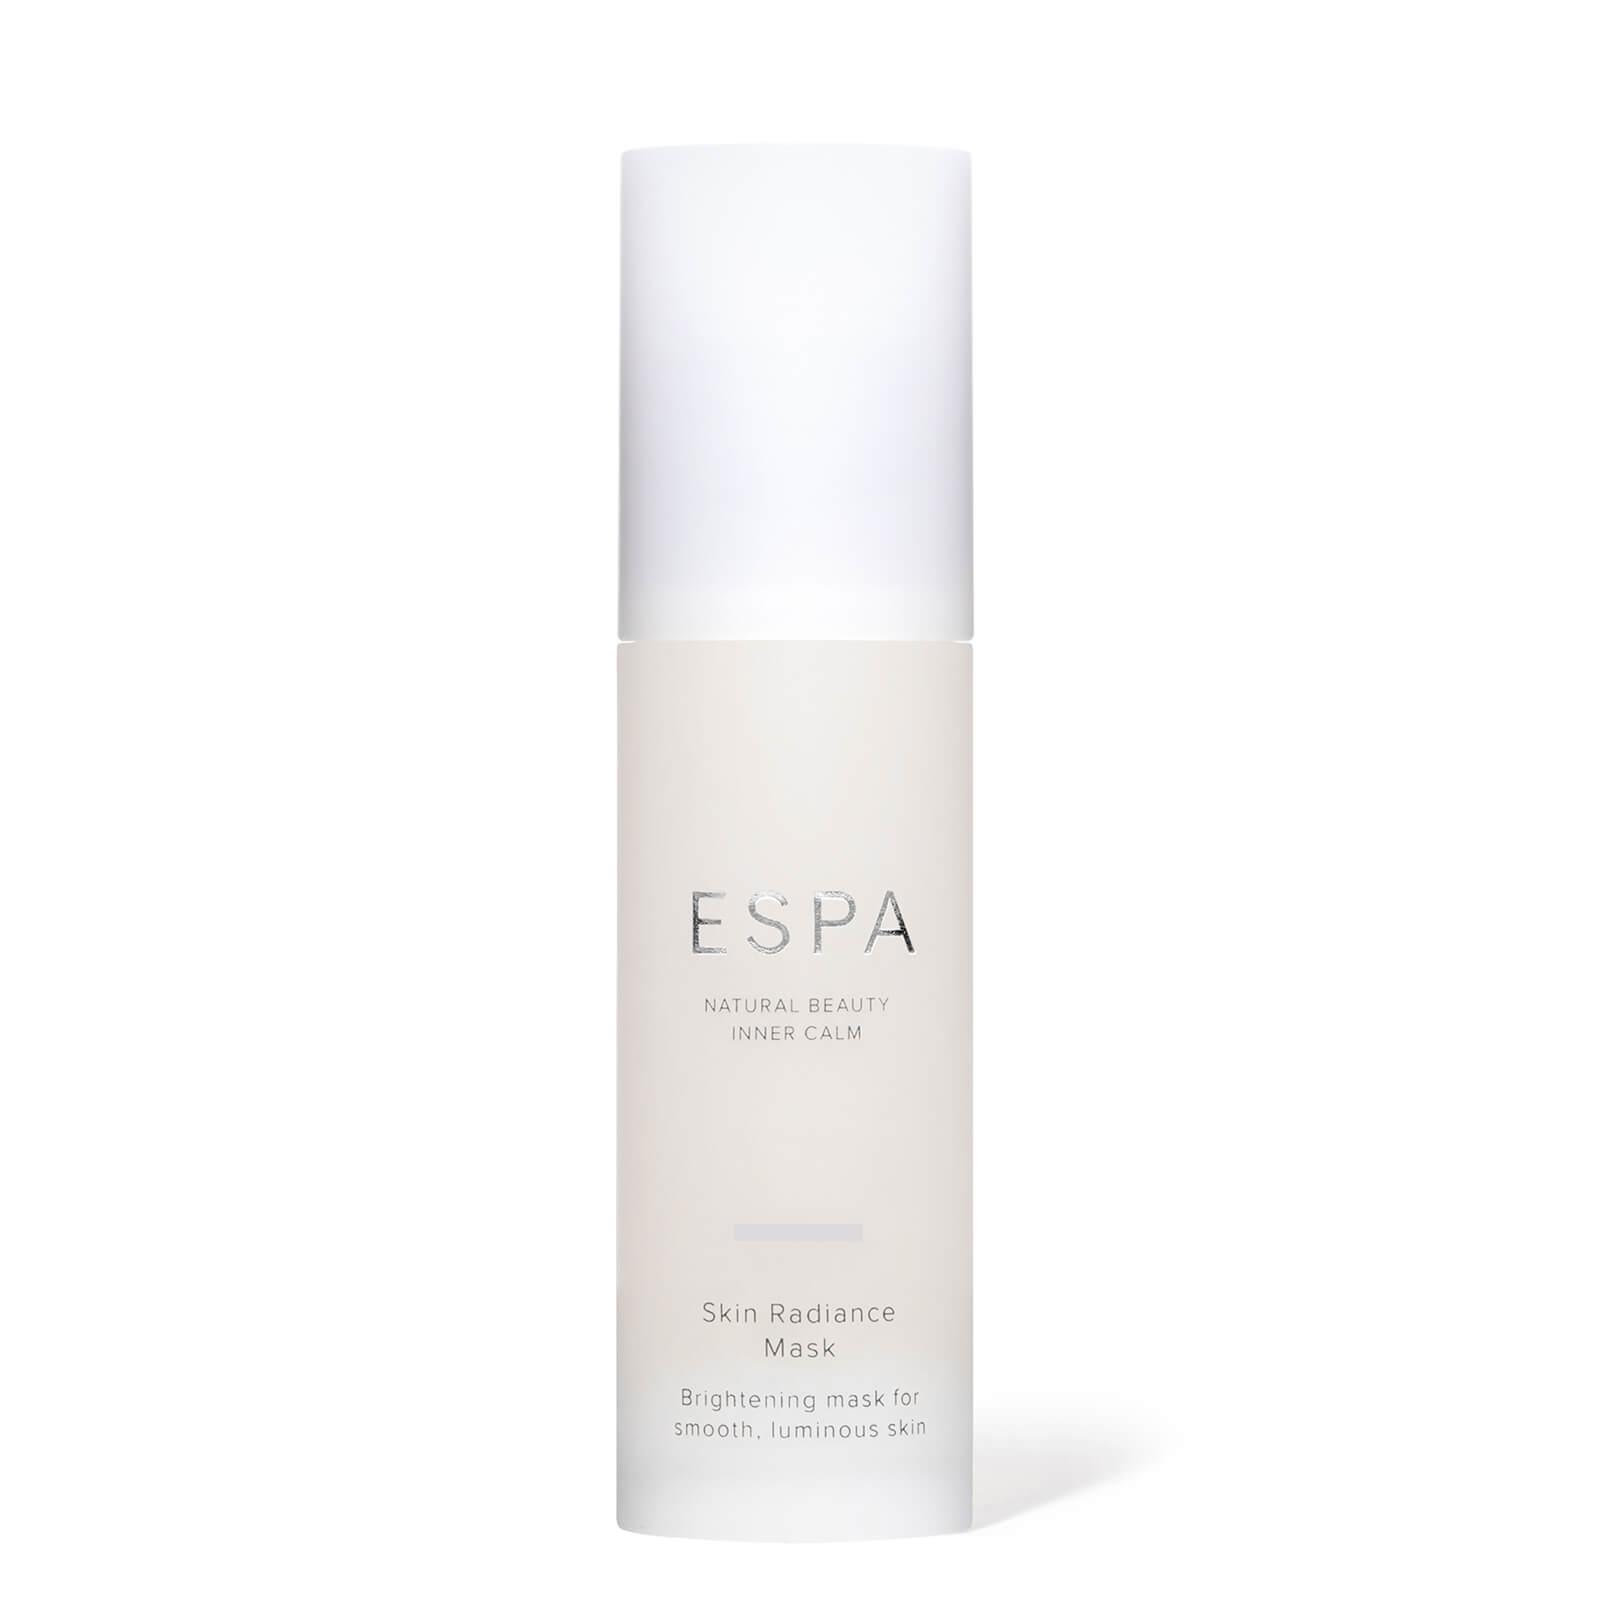 ESPA Masque Illuminateur Skin Radiance Mask ESPA 35ml